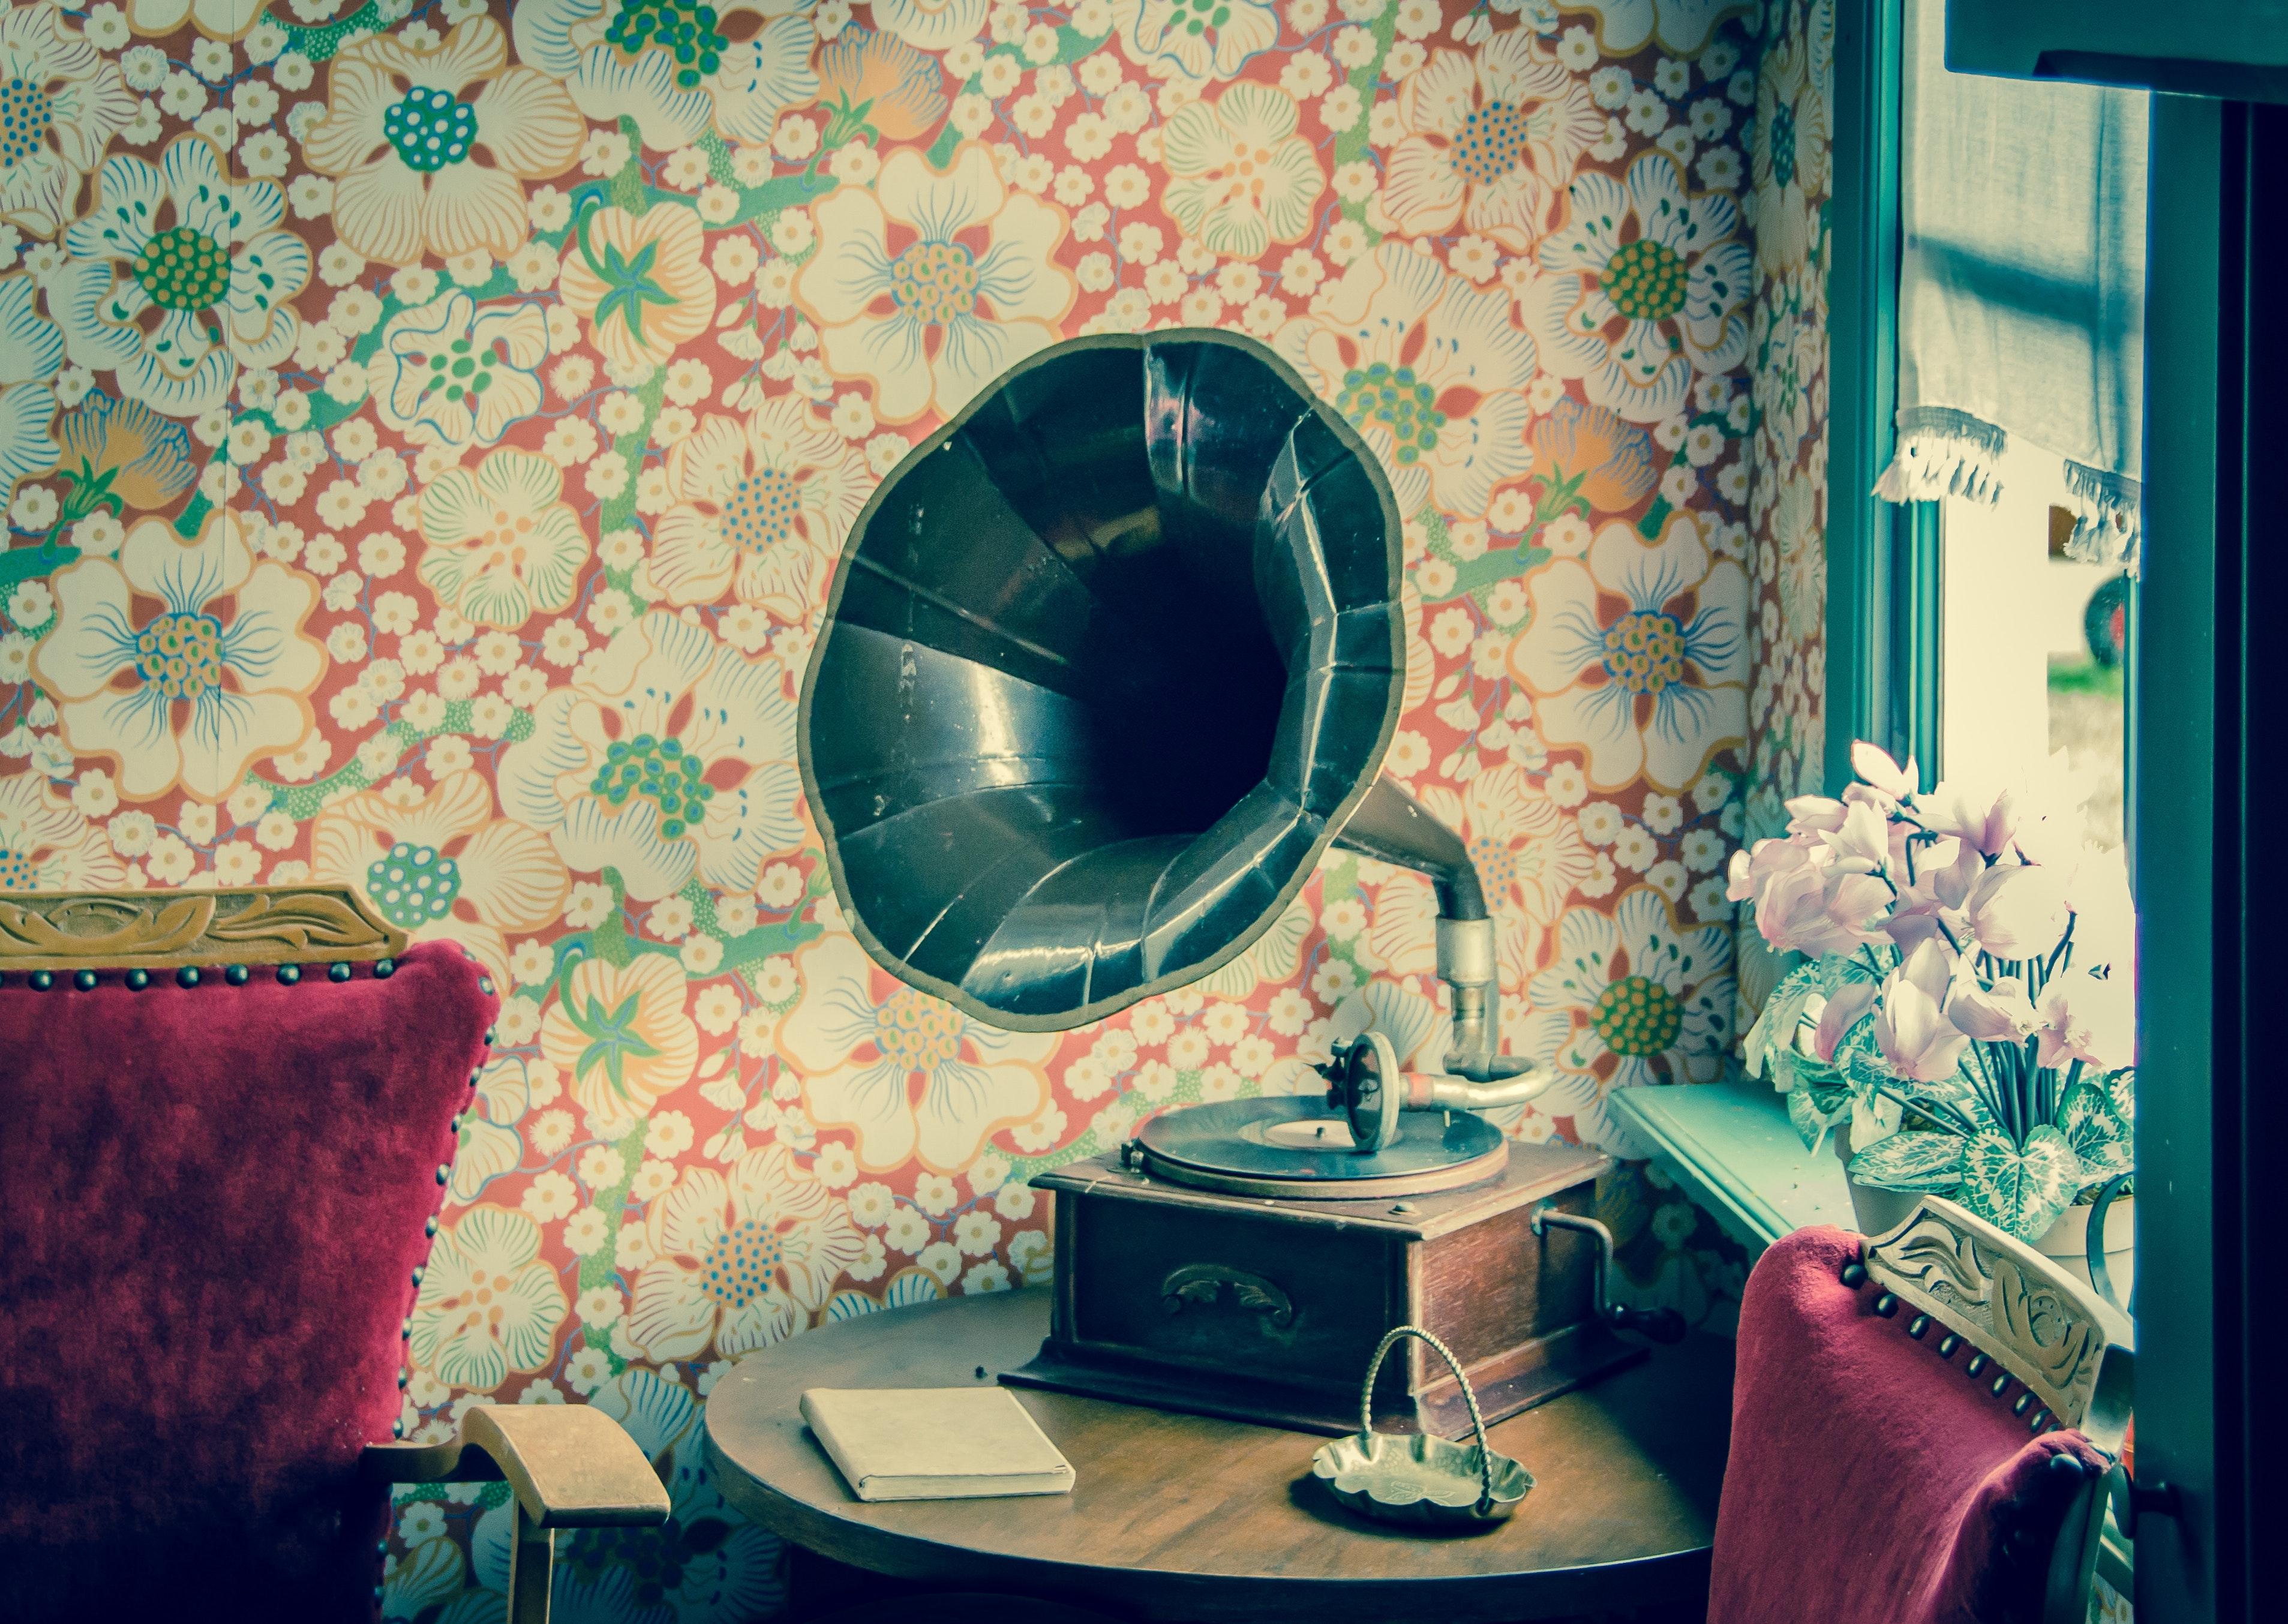 Brown and black gramophone photo